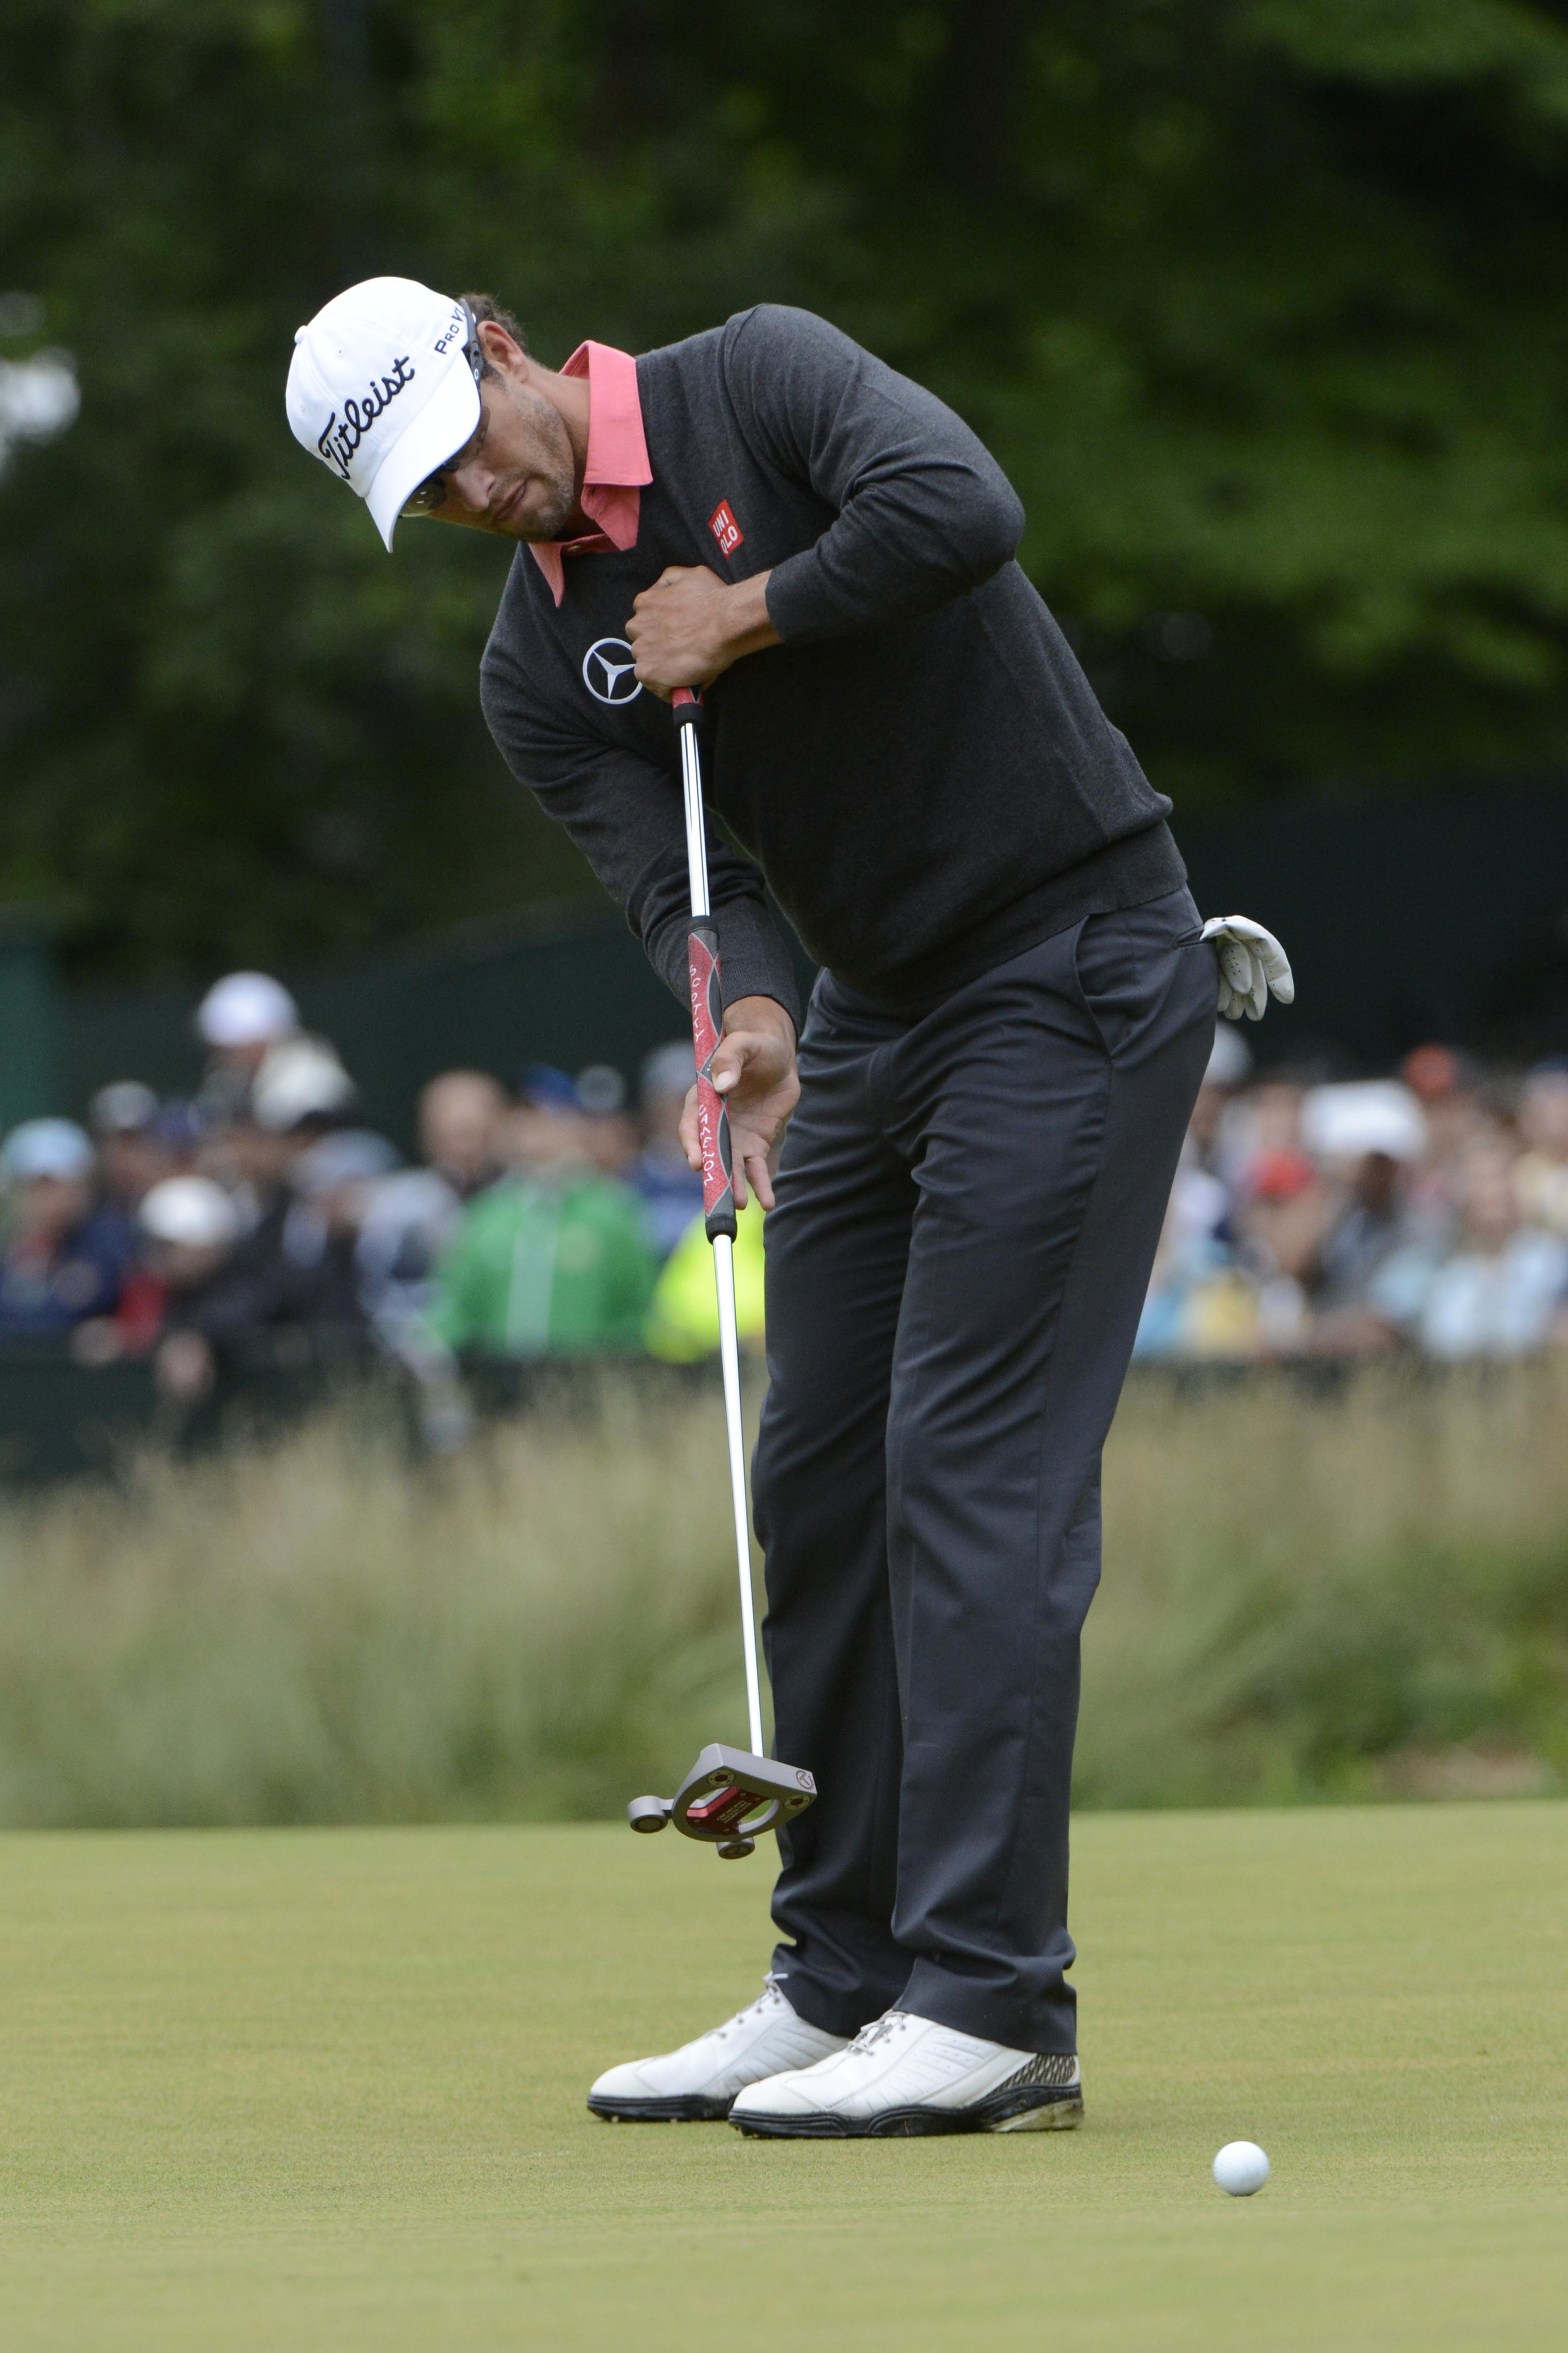 PGA Tour to adopt USGA ban on anchored putting